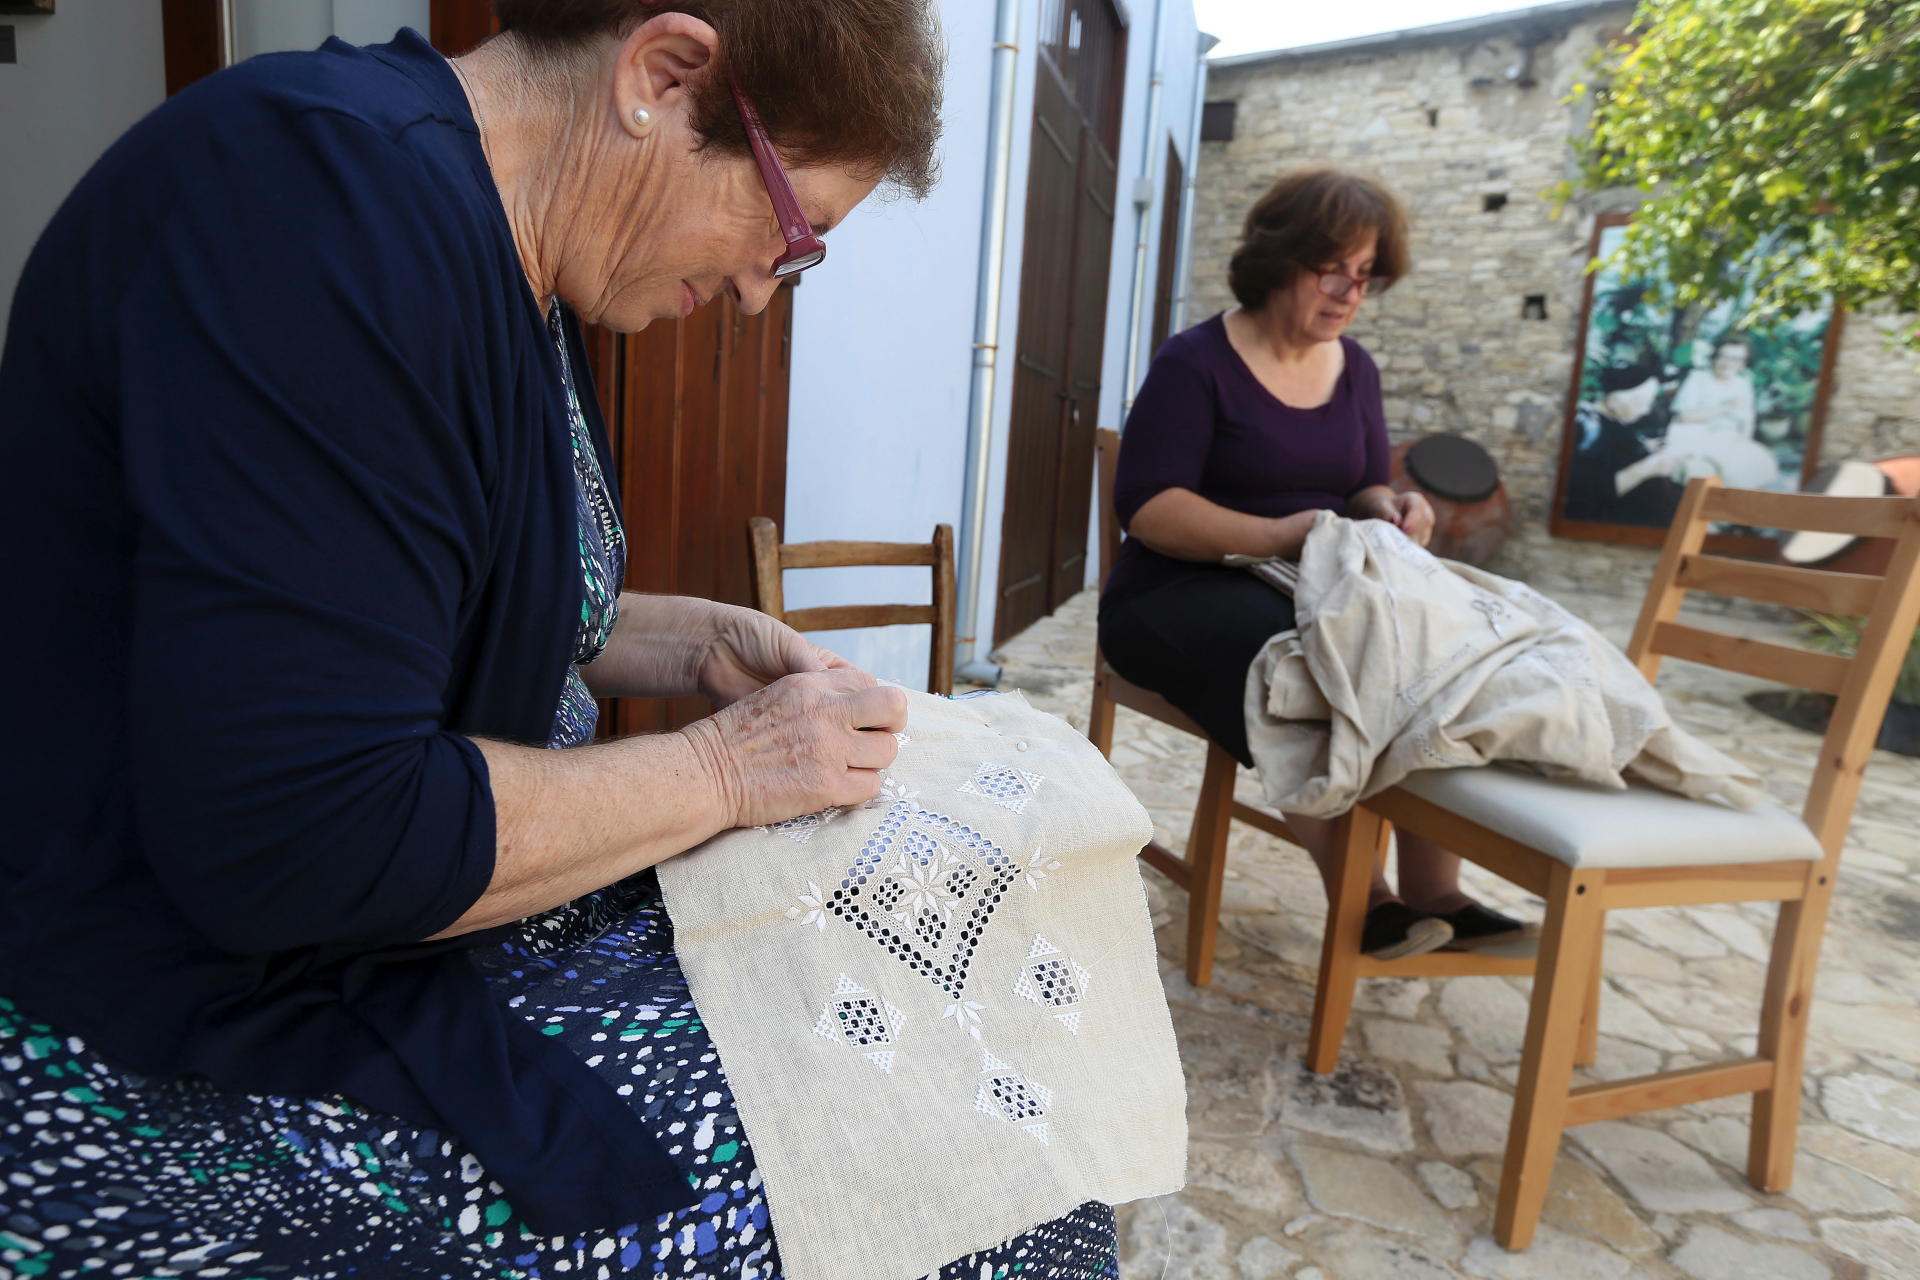 A stitch in time: Cyprus' Lefkaritiko lace faces grim future